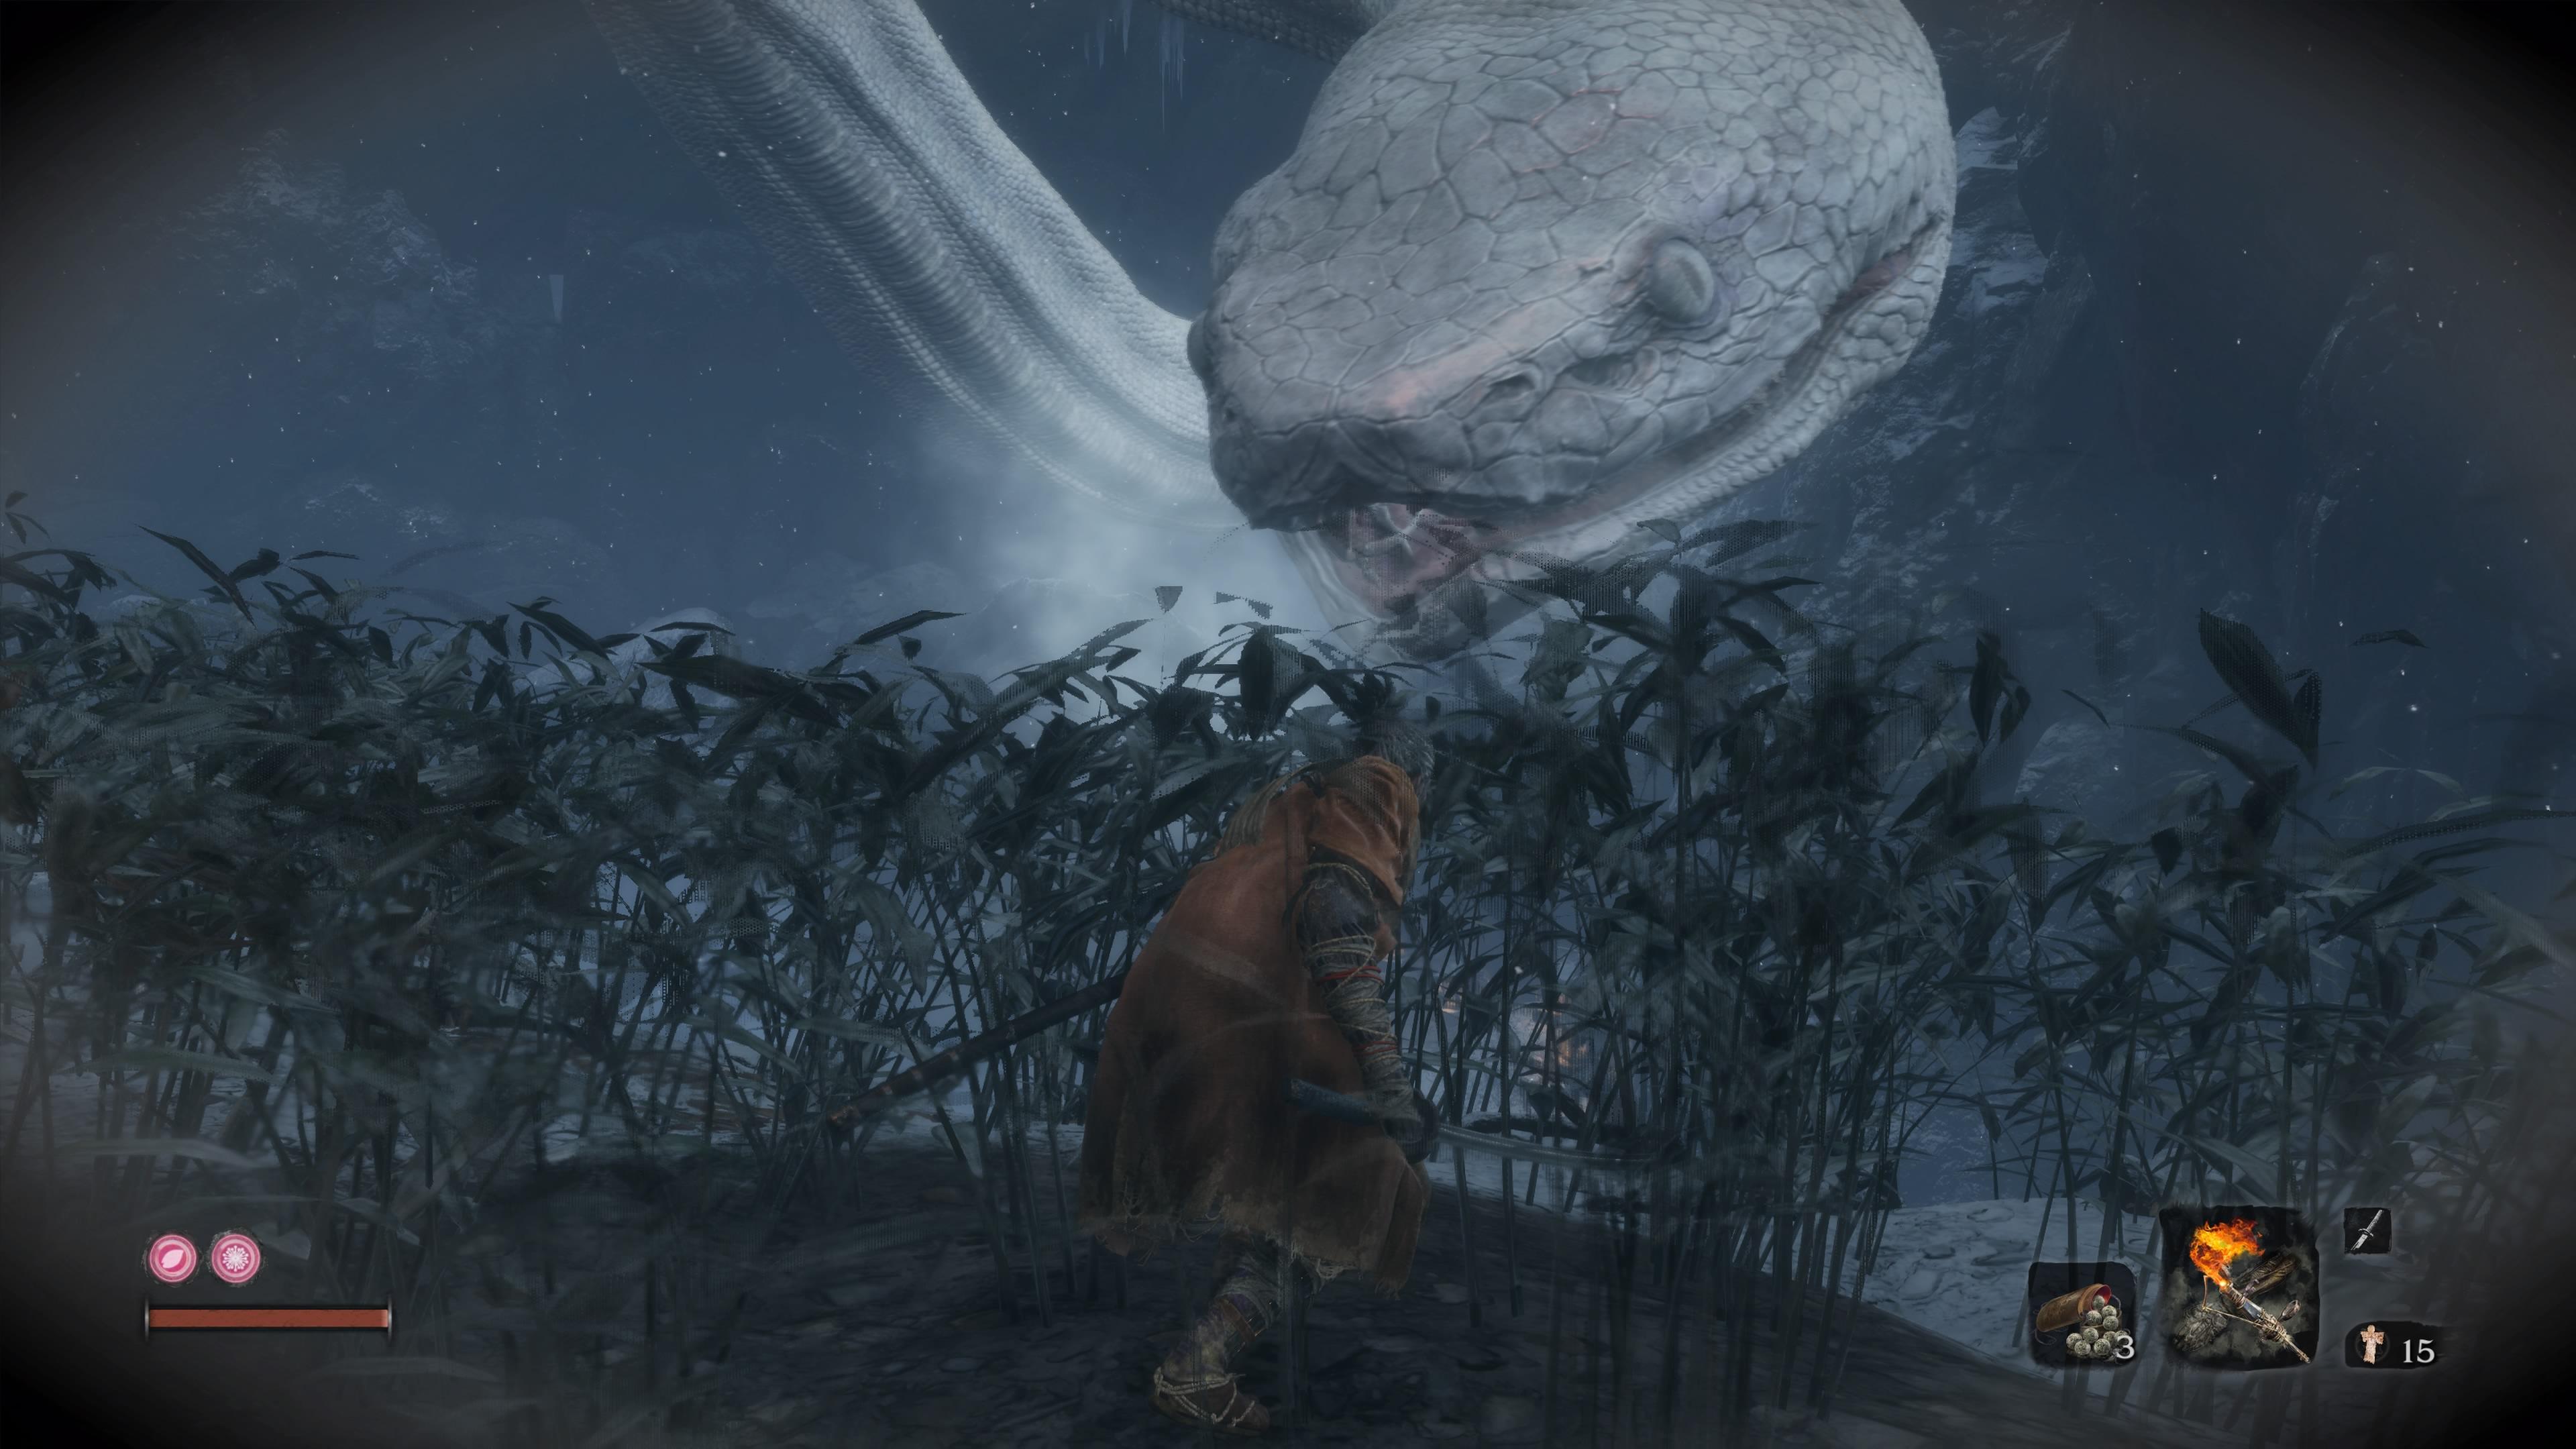 Sekiro-ShadowsDieTwice PS4 Test 015